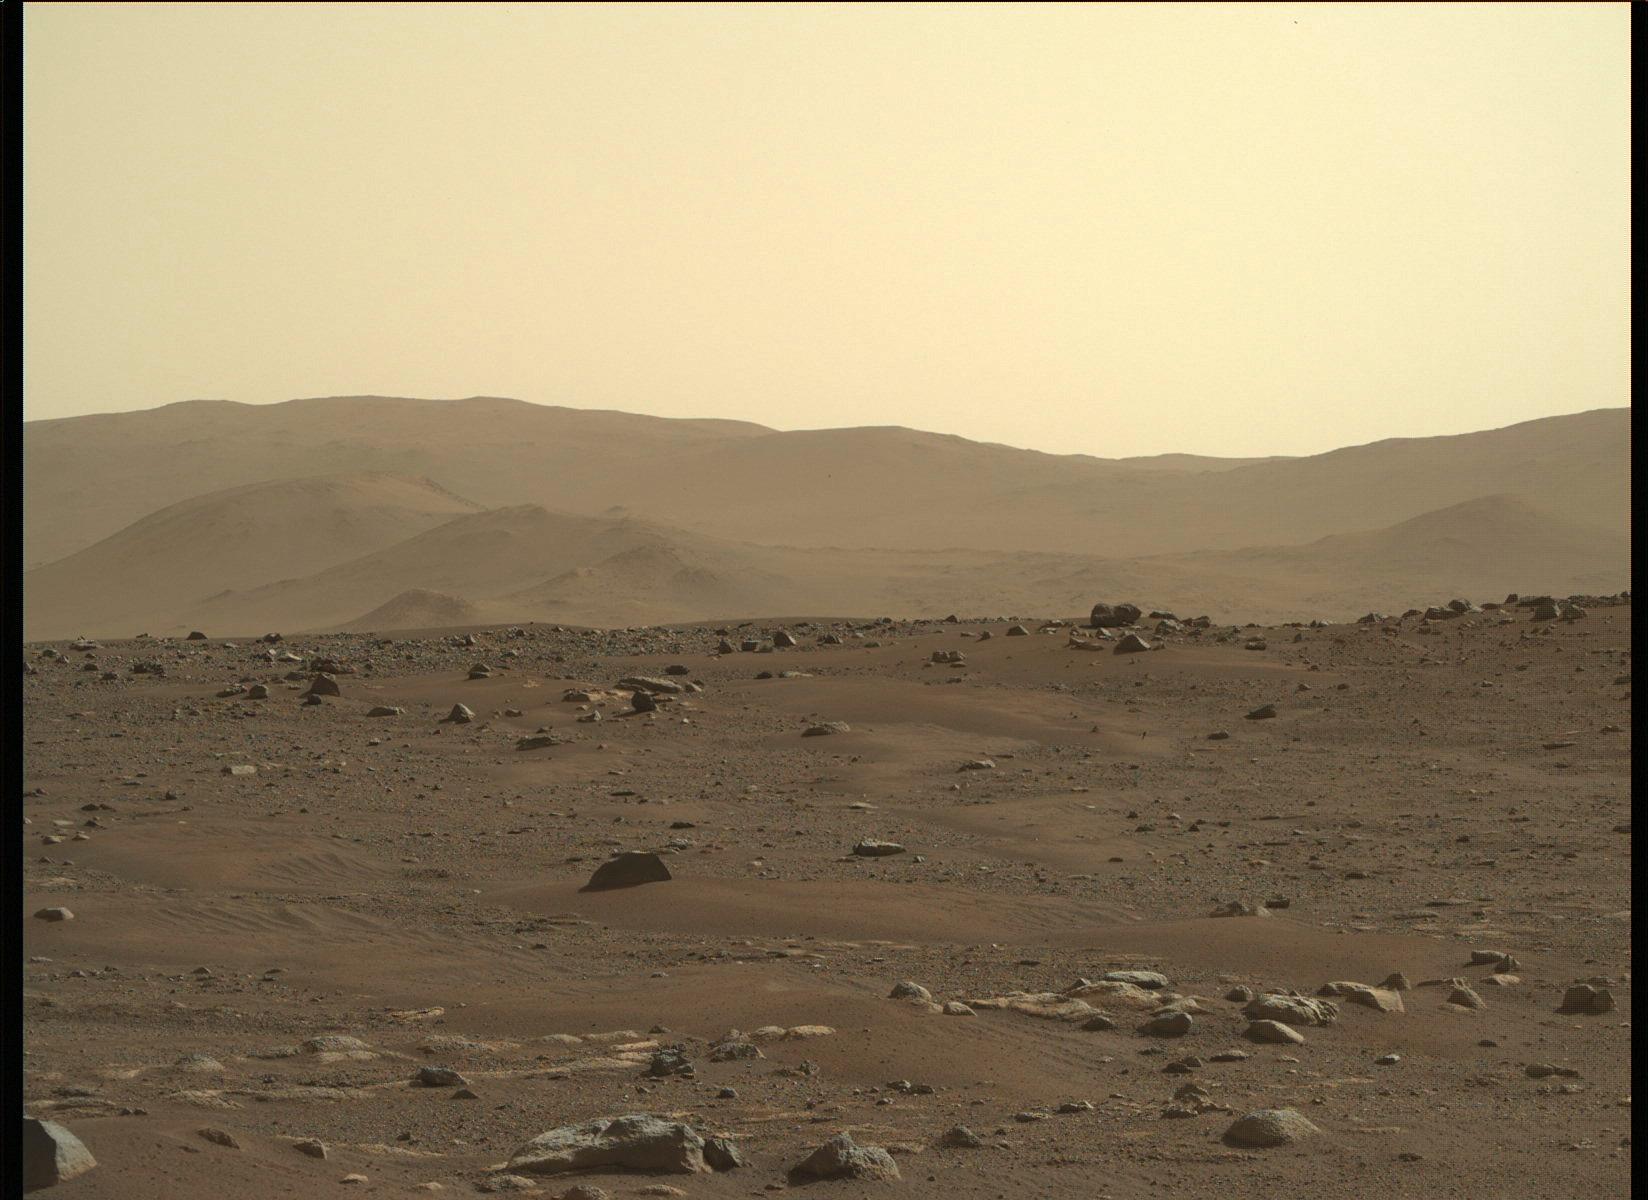 Mars Perseverance